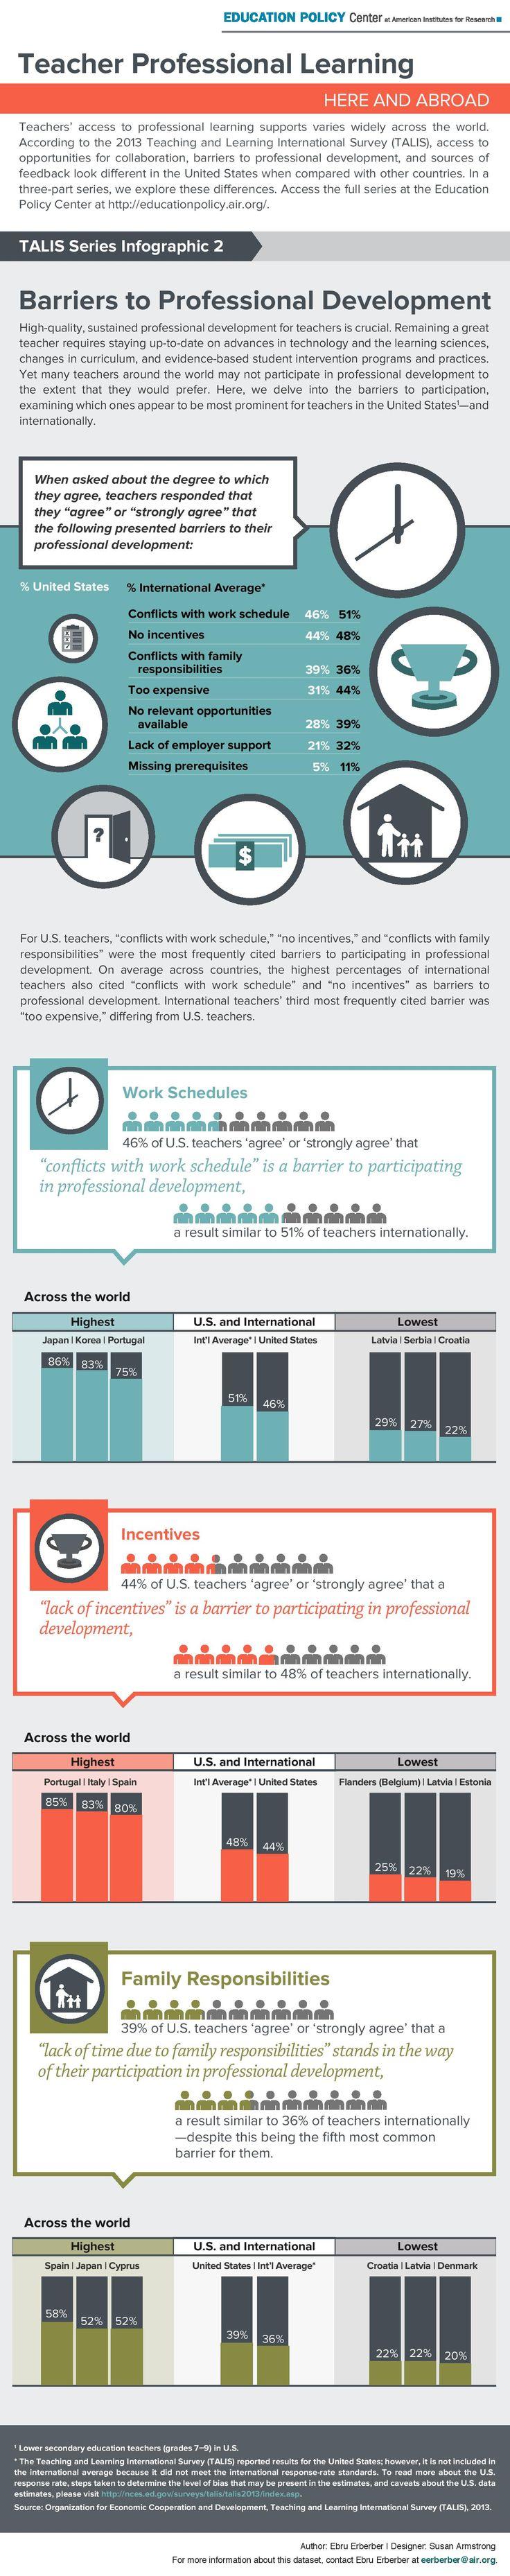 Teachers' Professional Development Barriers Infographic - http://elearninginfographics.com/teachers-professional-development-barriers-infographic/